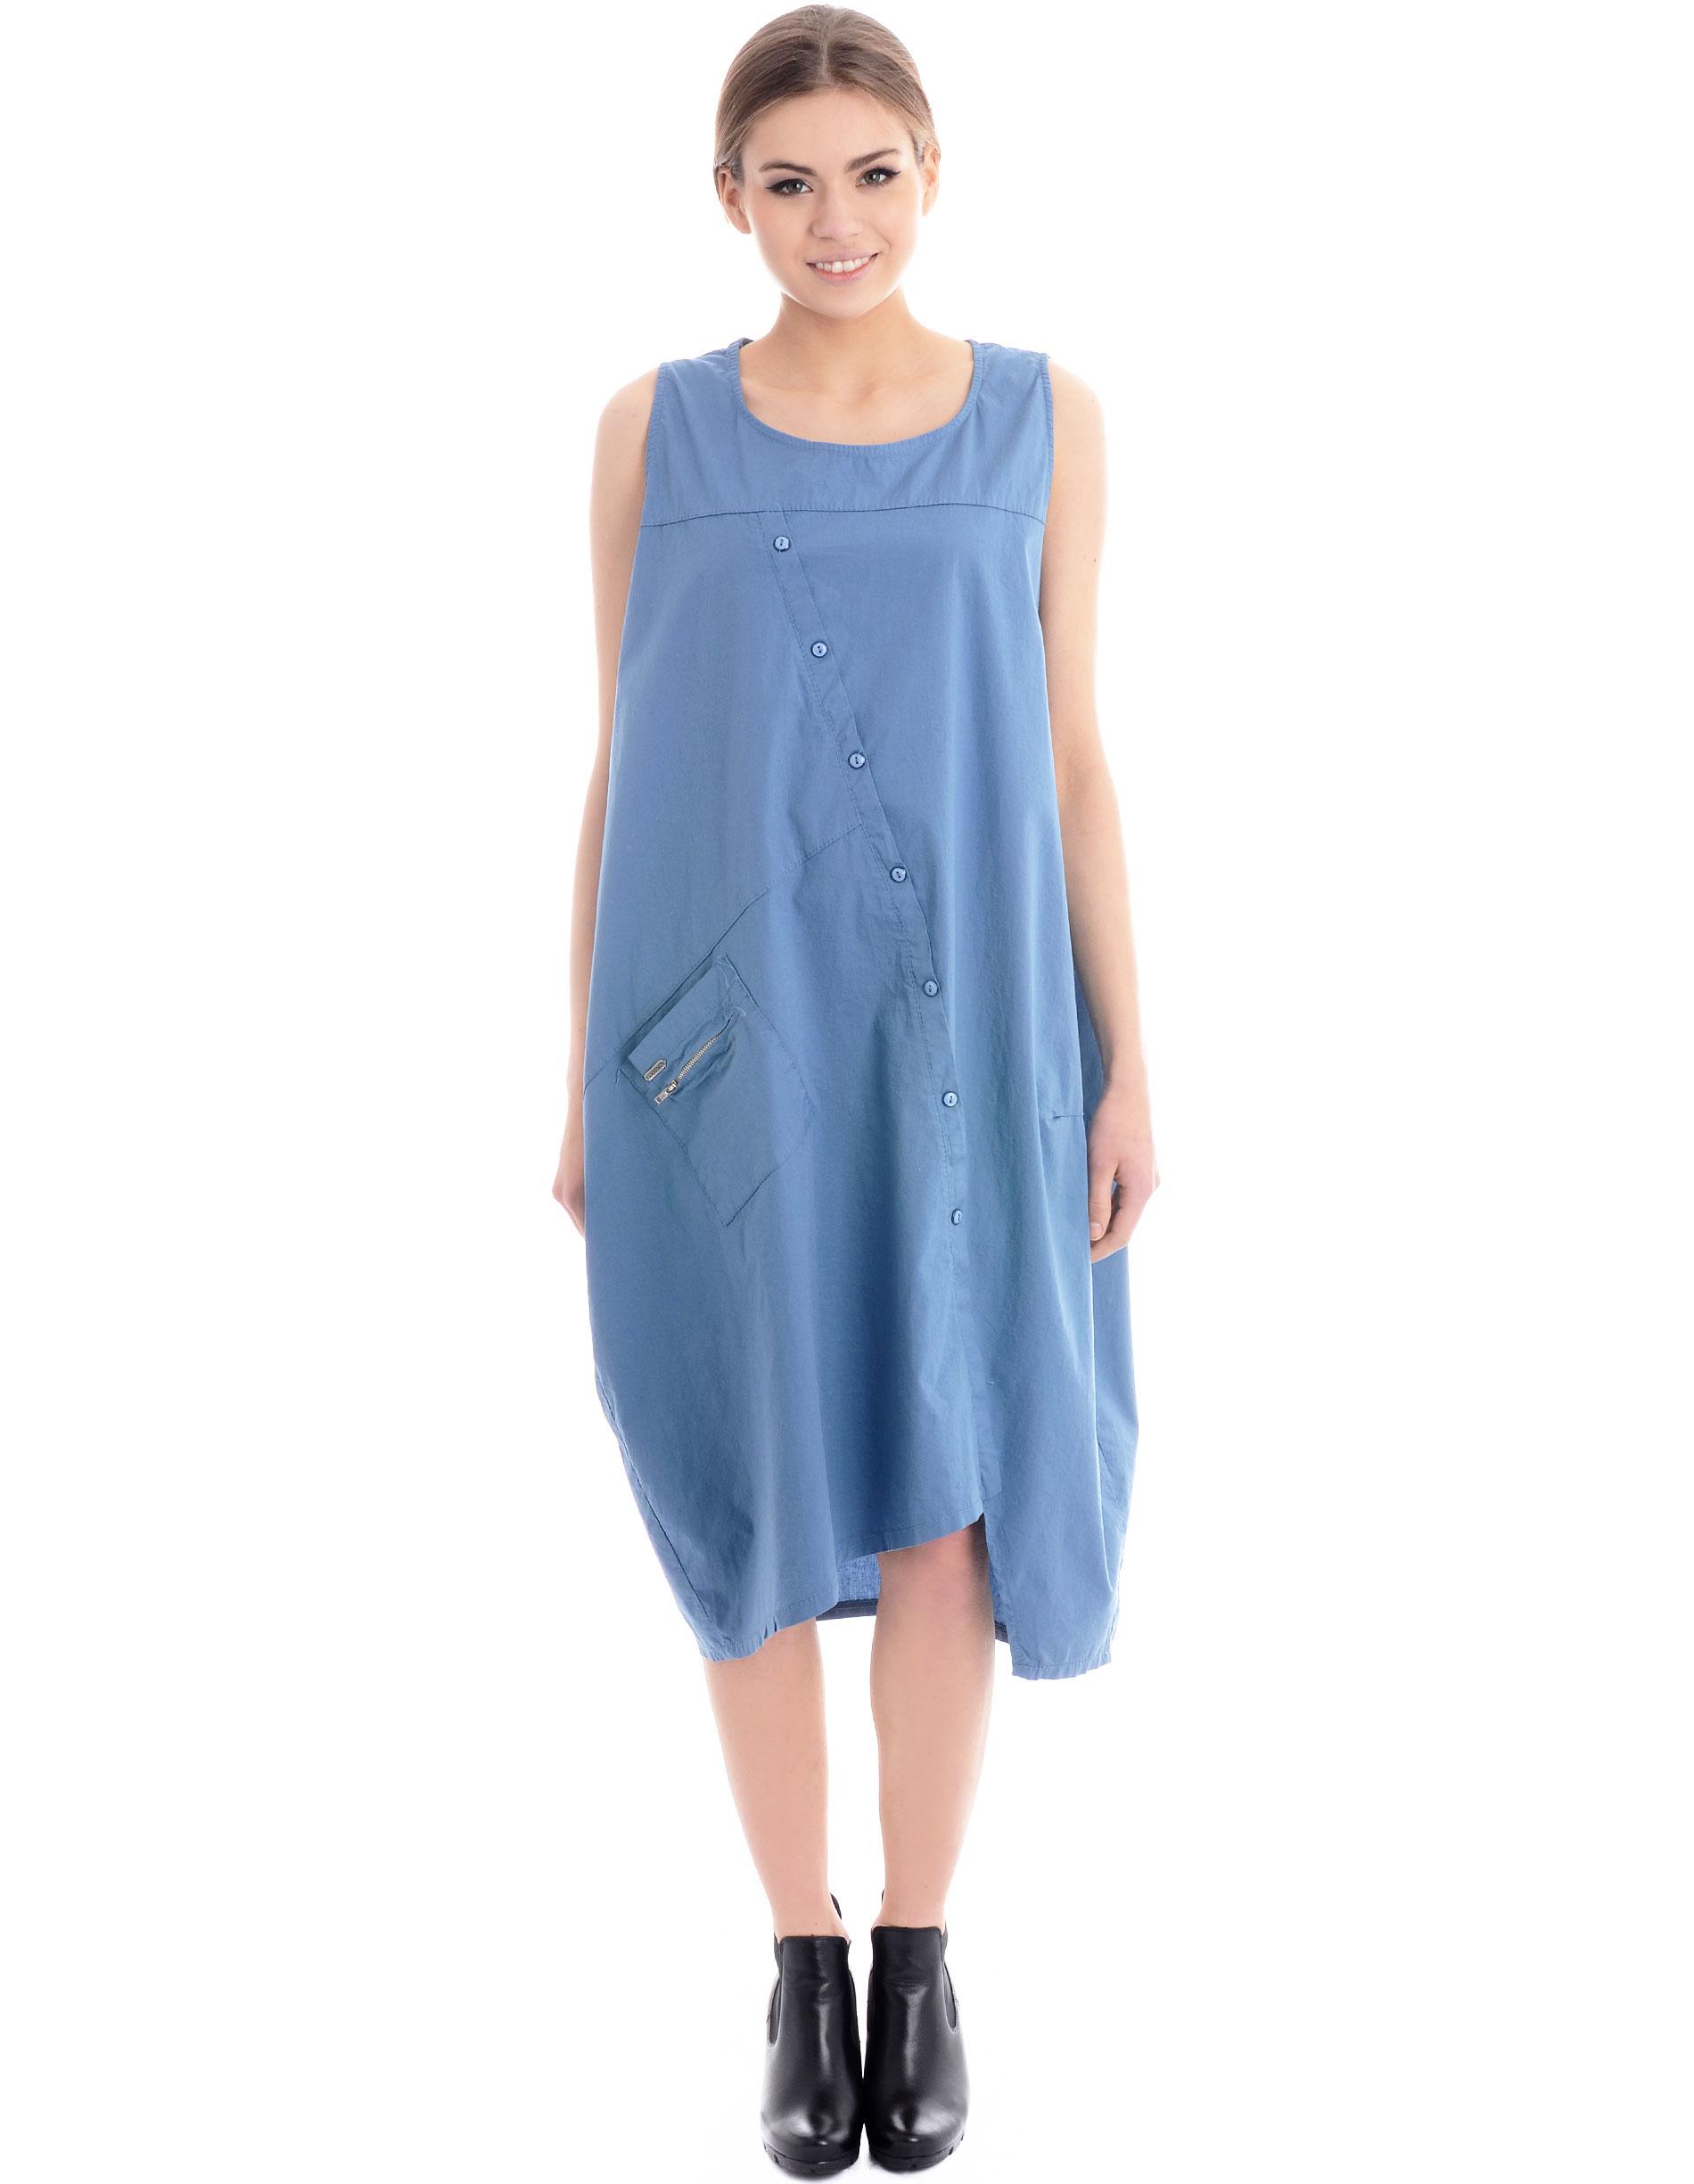 Sukienka - 4-7033 JEANS - Unisono